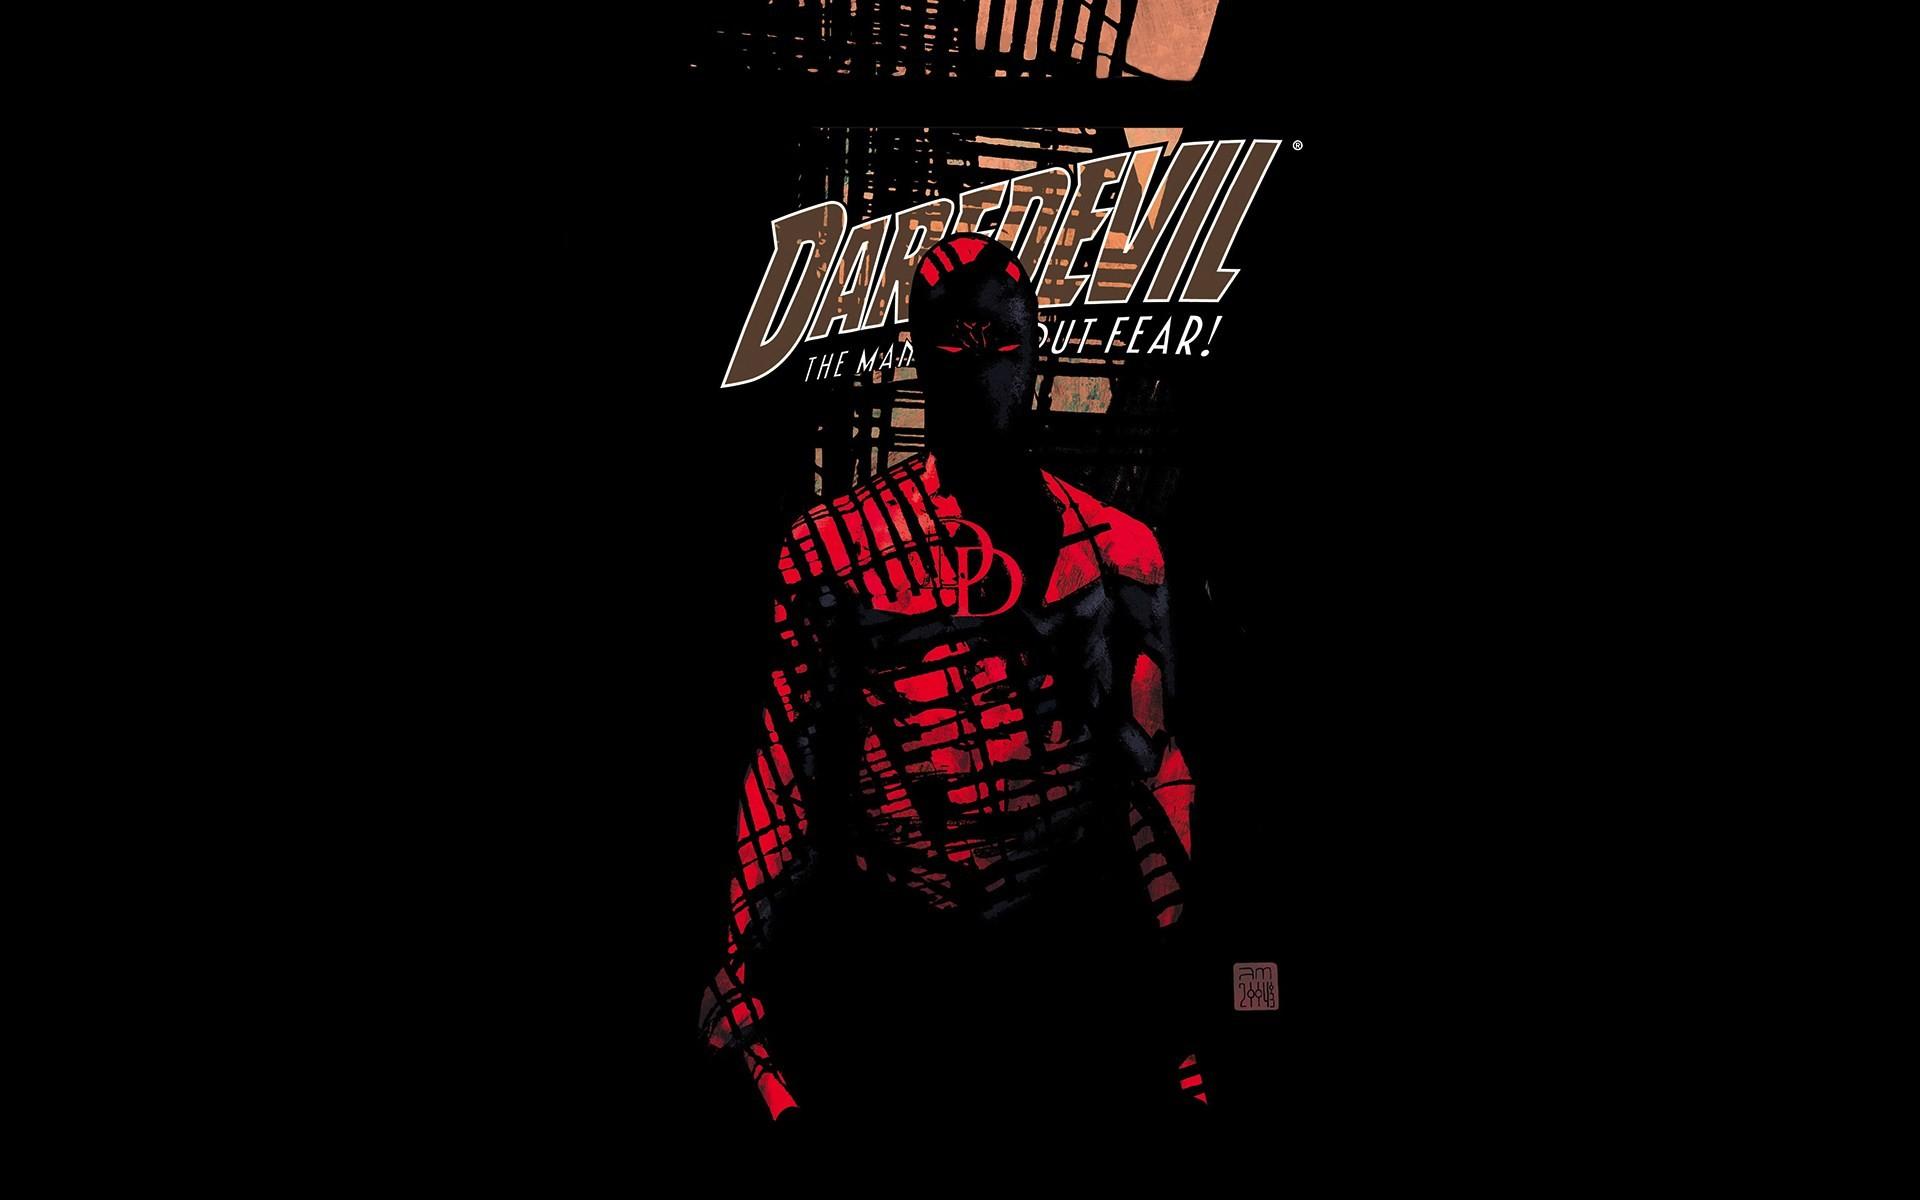 Free Download Daredevil Wallpapers HD. daredevil wallpaper